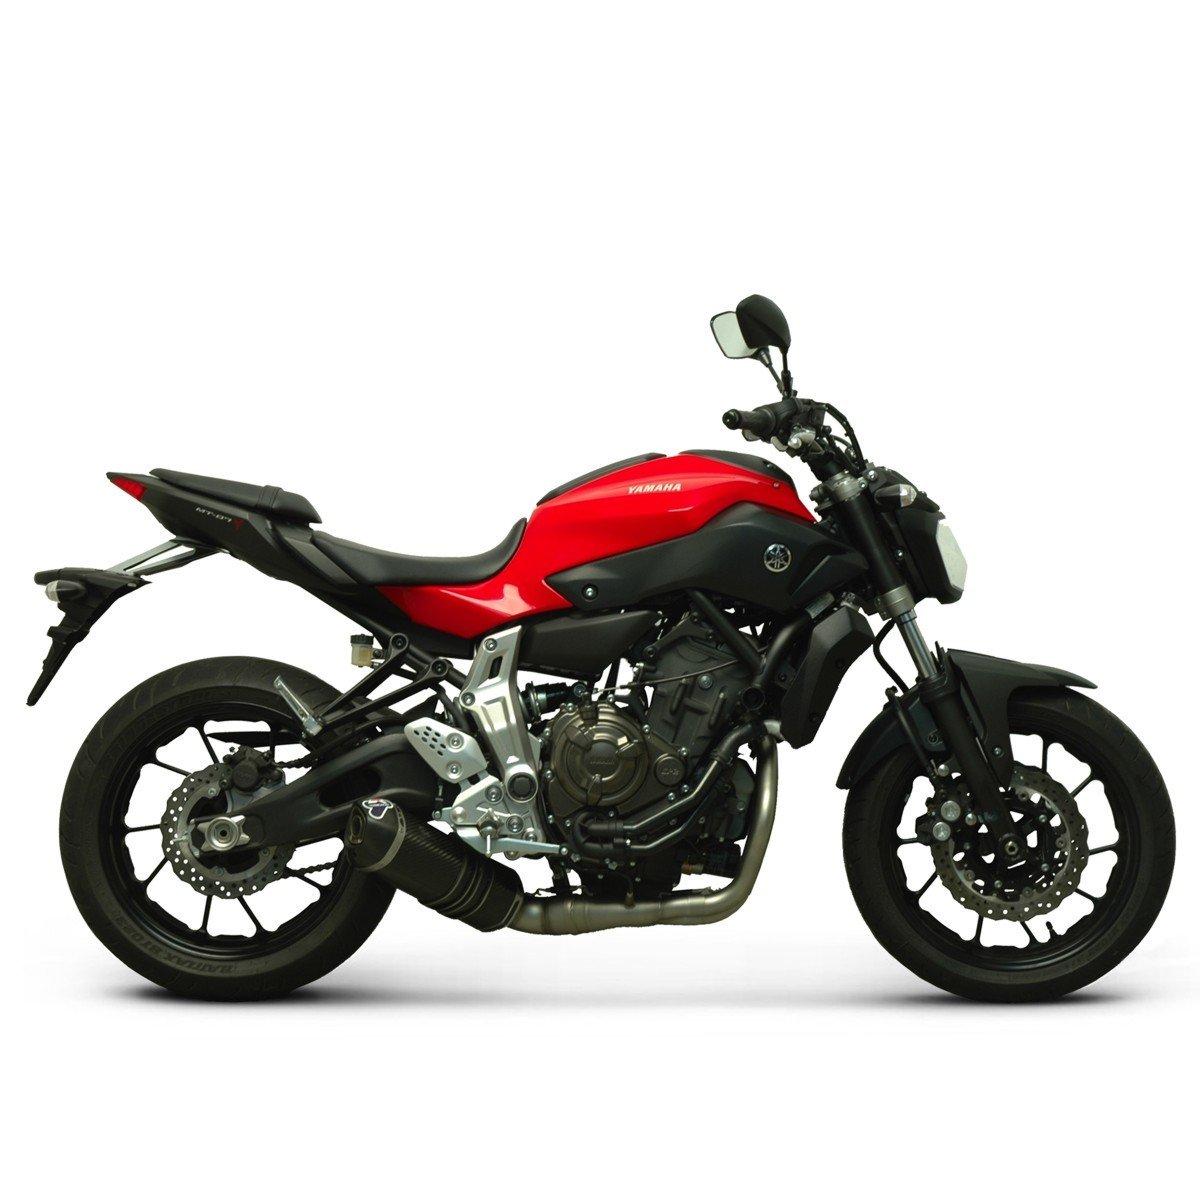 Termignoni Homologated Carbon Exhaust System Yamaha MT-07 (14)